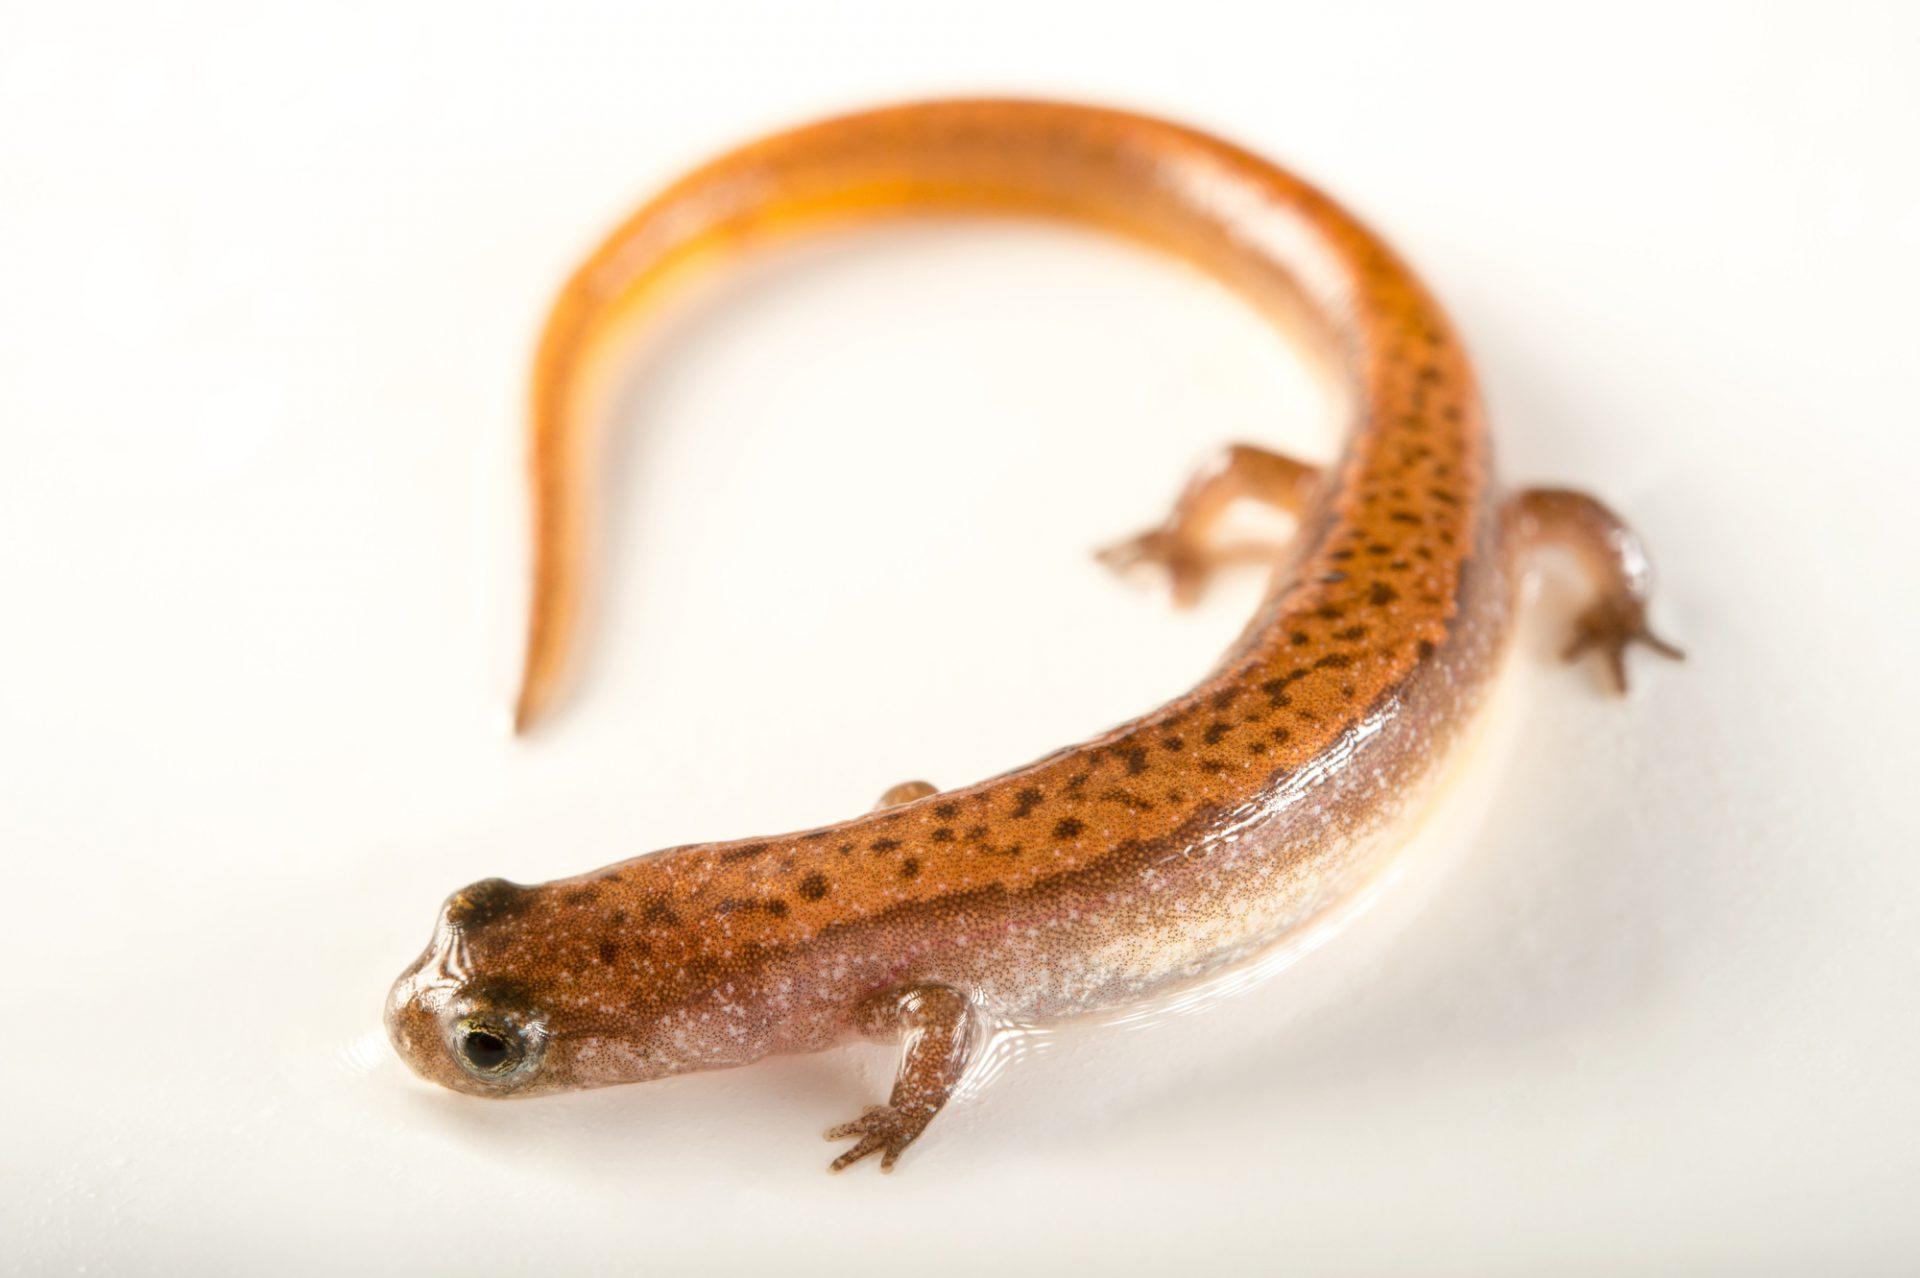 Picture of a dwarf salamander (Eurycea quadradigitata) from Dagray Resevoir, Arkansas.